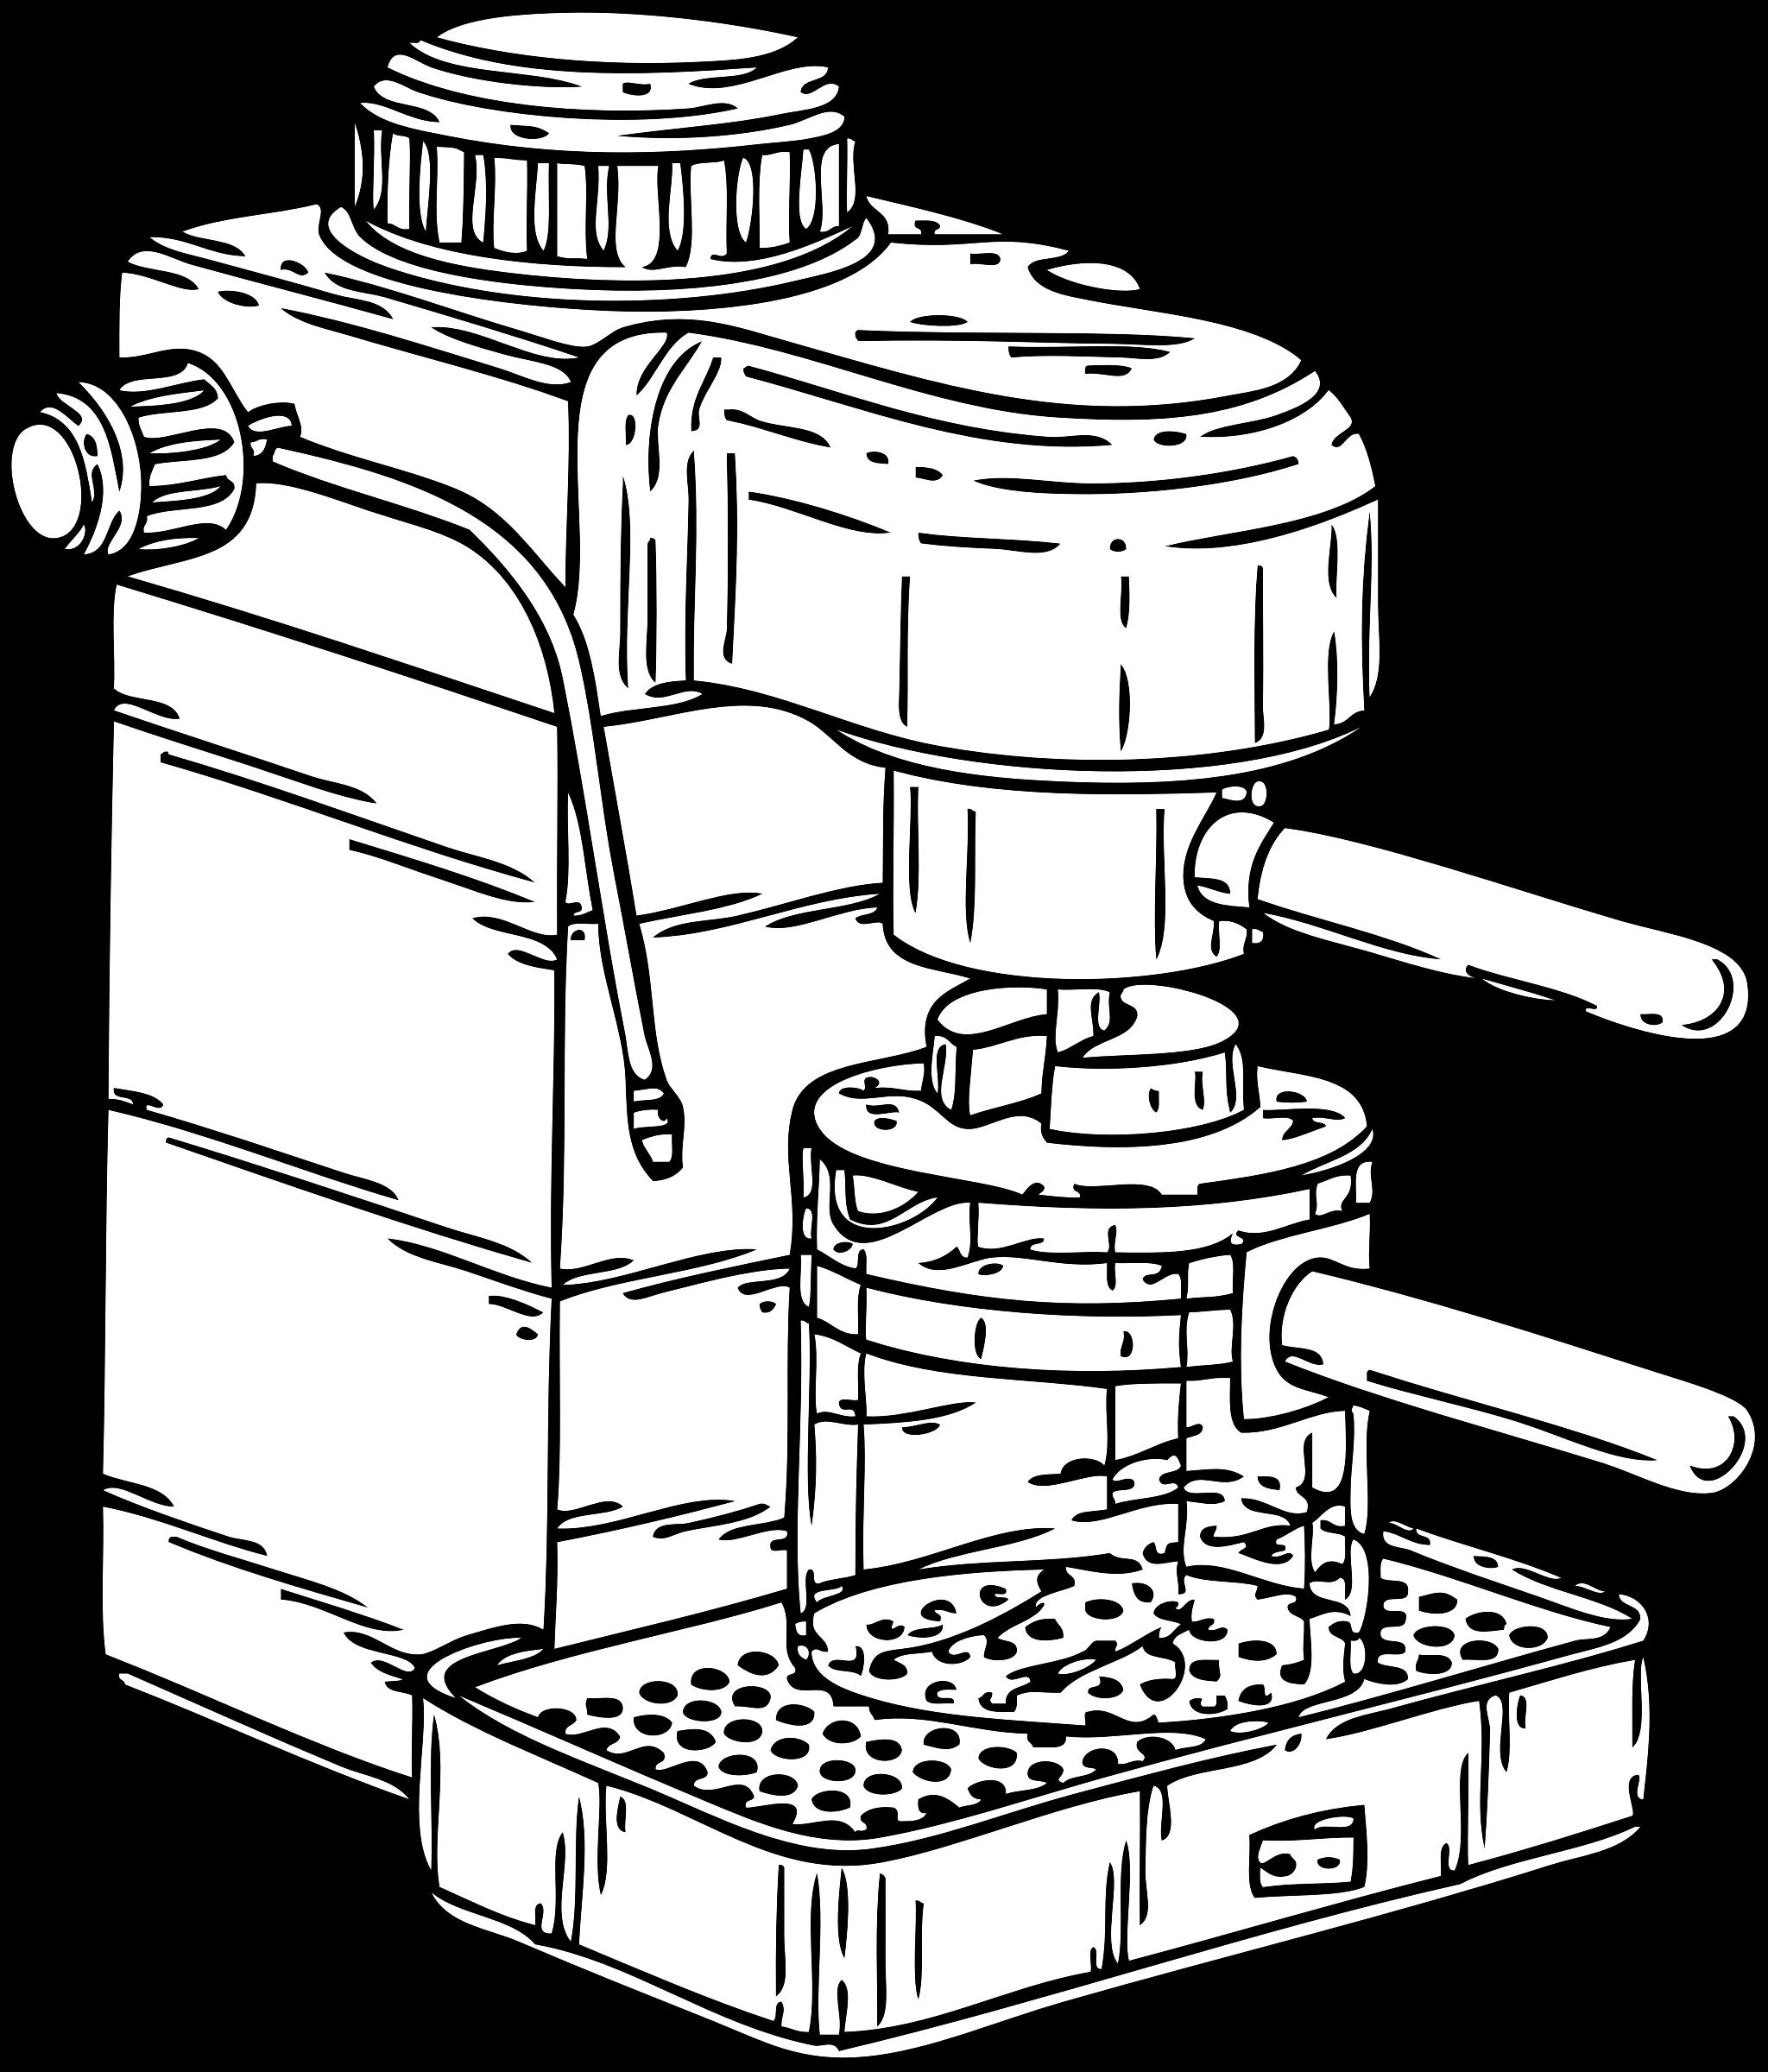 Espresso maker big image. Clipart kitchen drawing